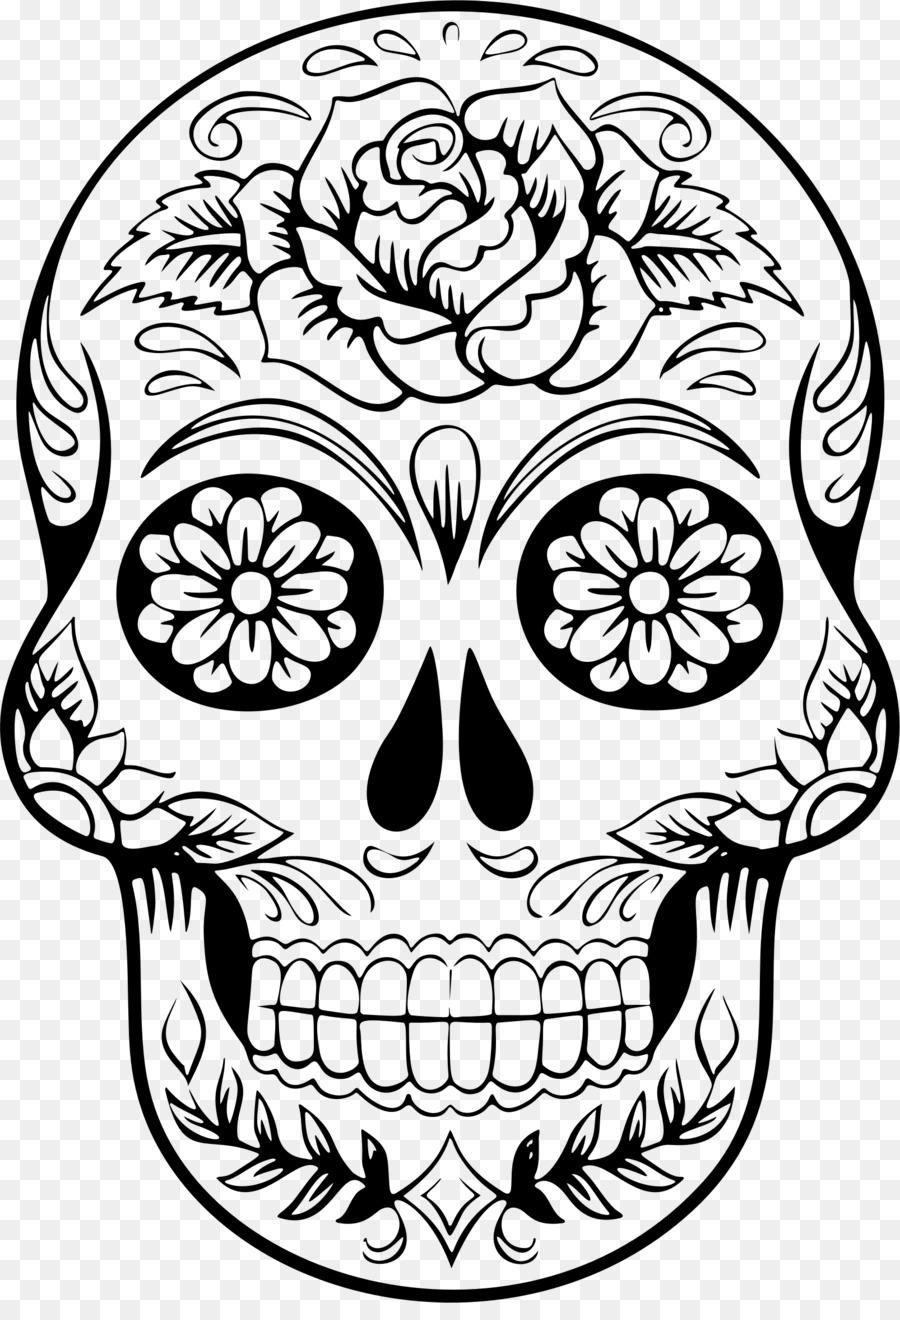 Calavera Skull Day of the Dead Clip art - color skull png download ...